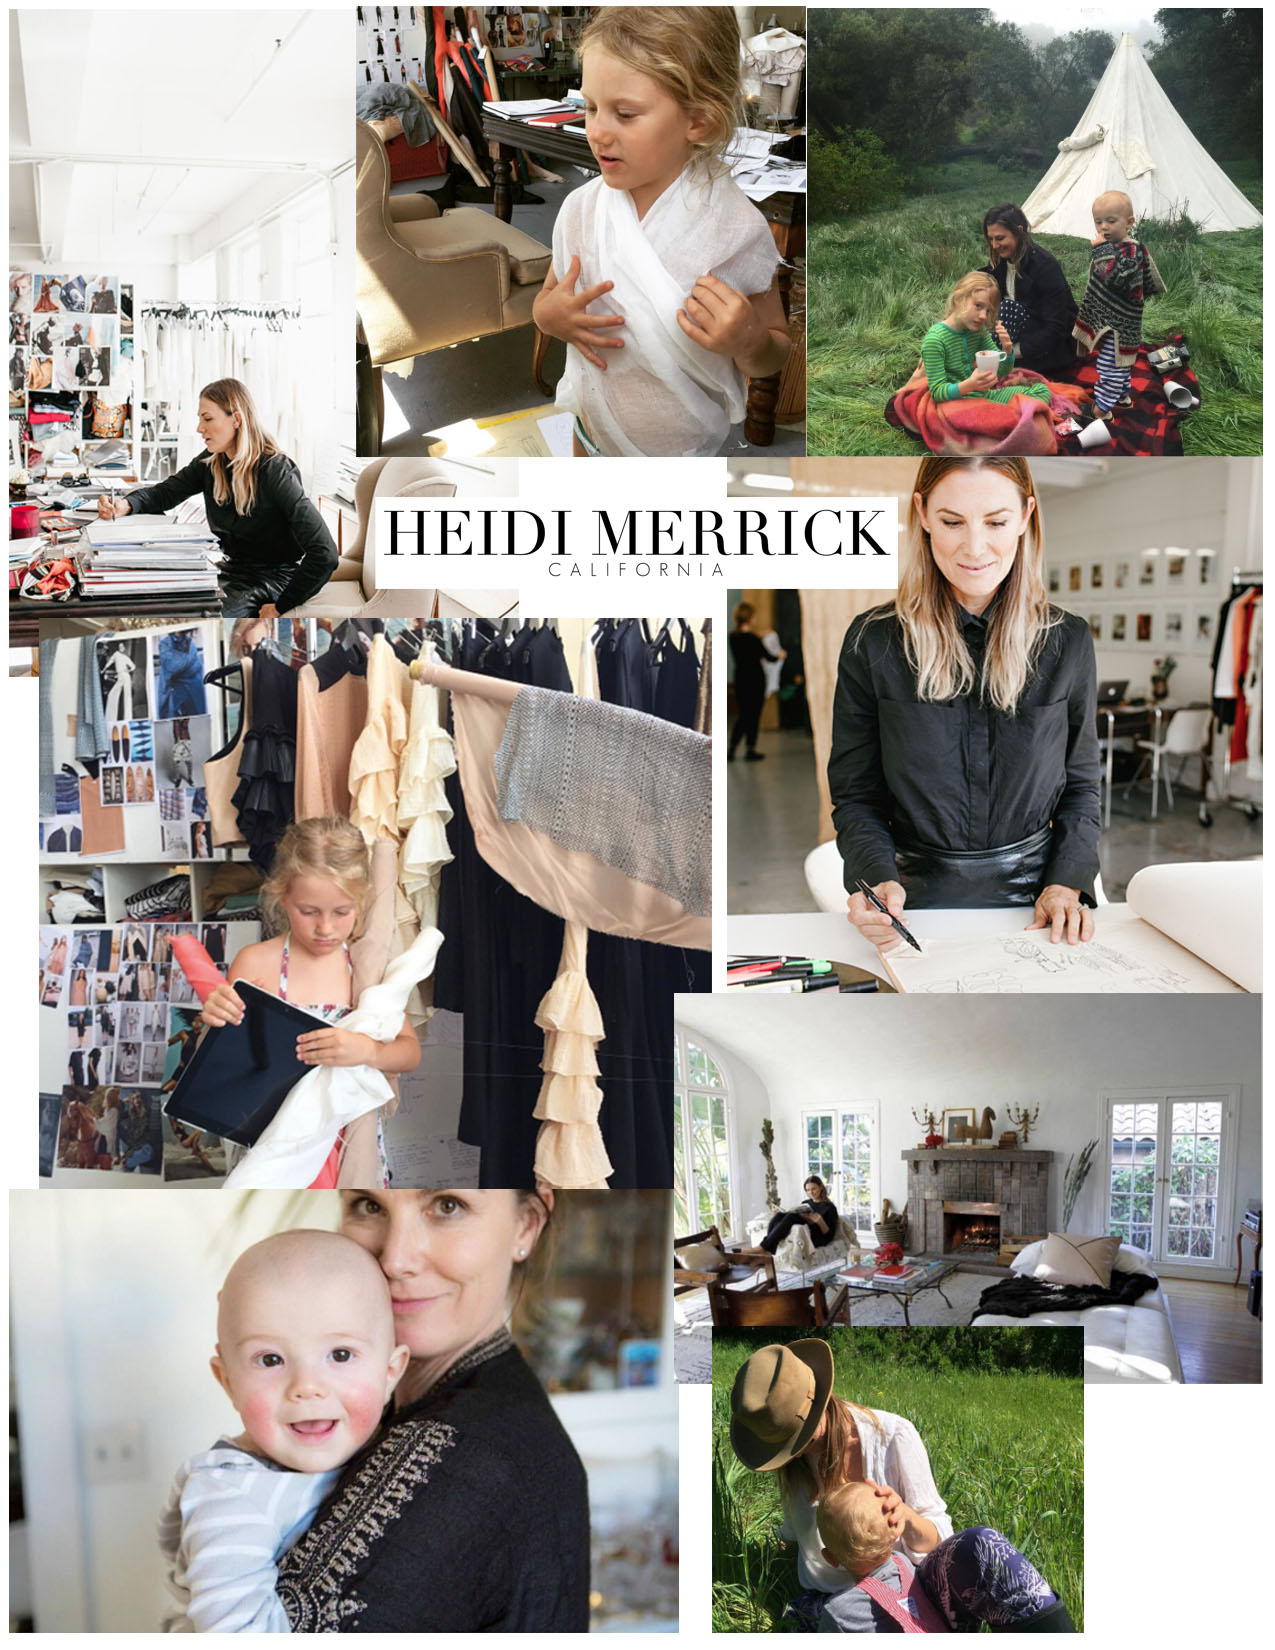 Heidi Merrick